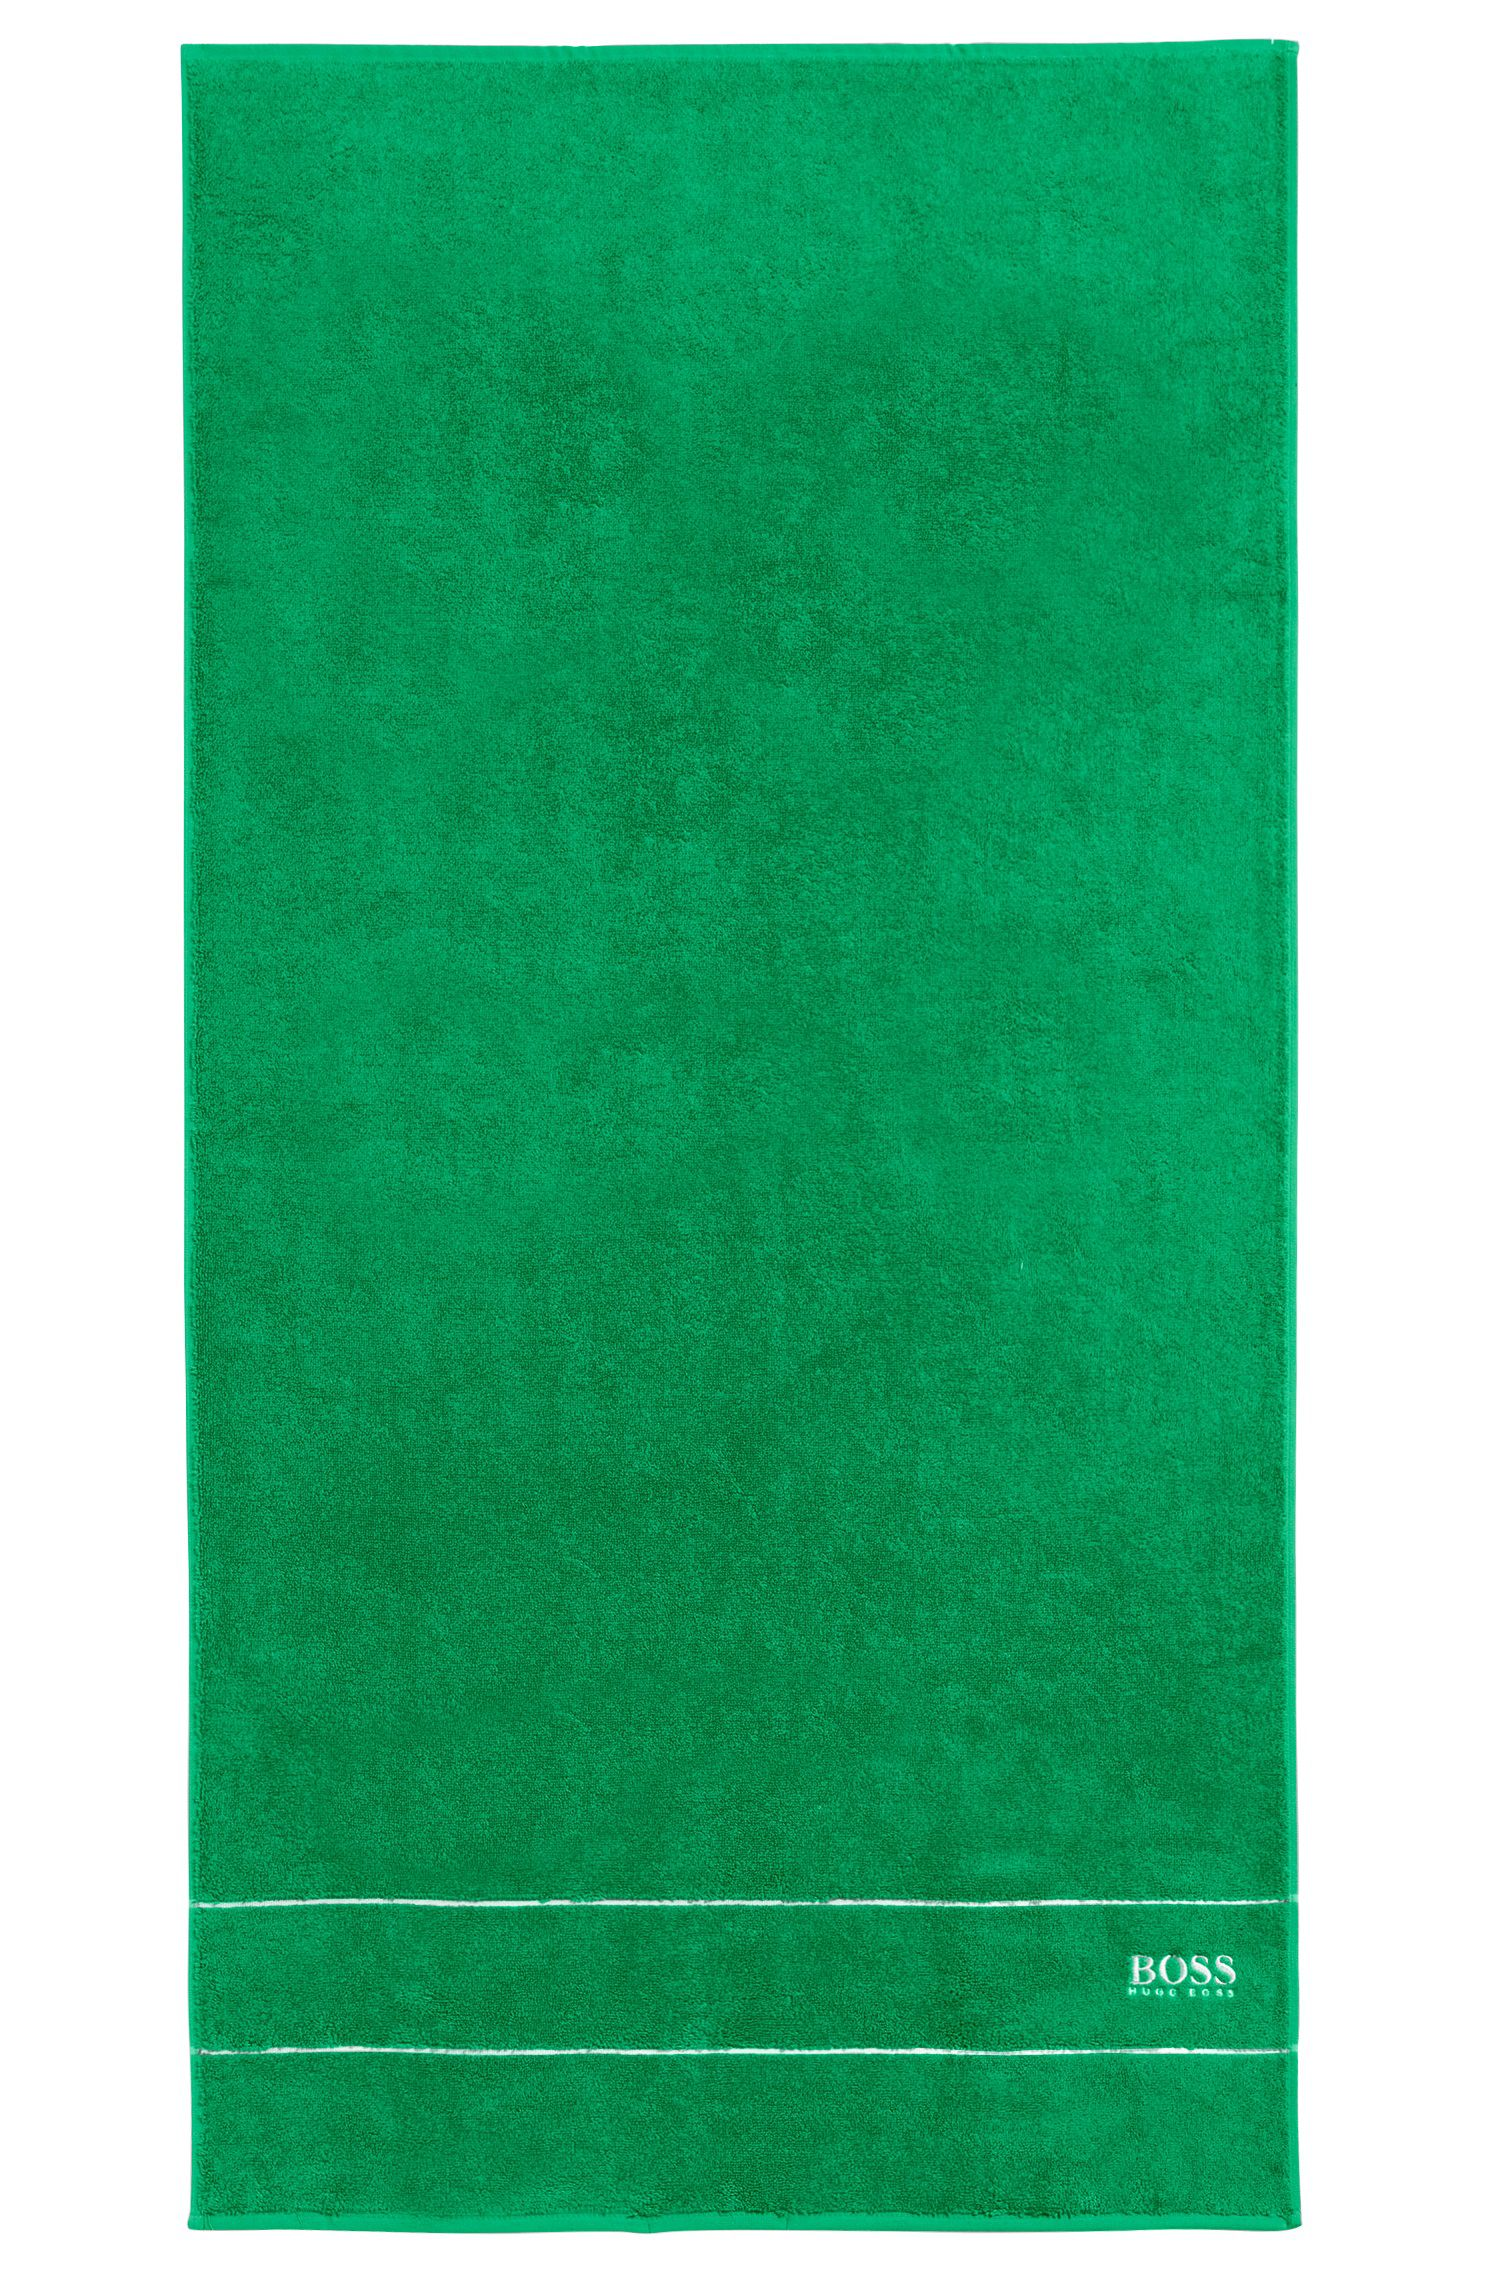 Finest Egyptian cotton bath towel with logo border